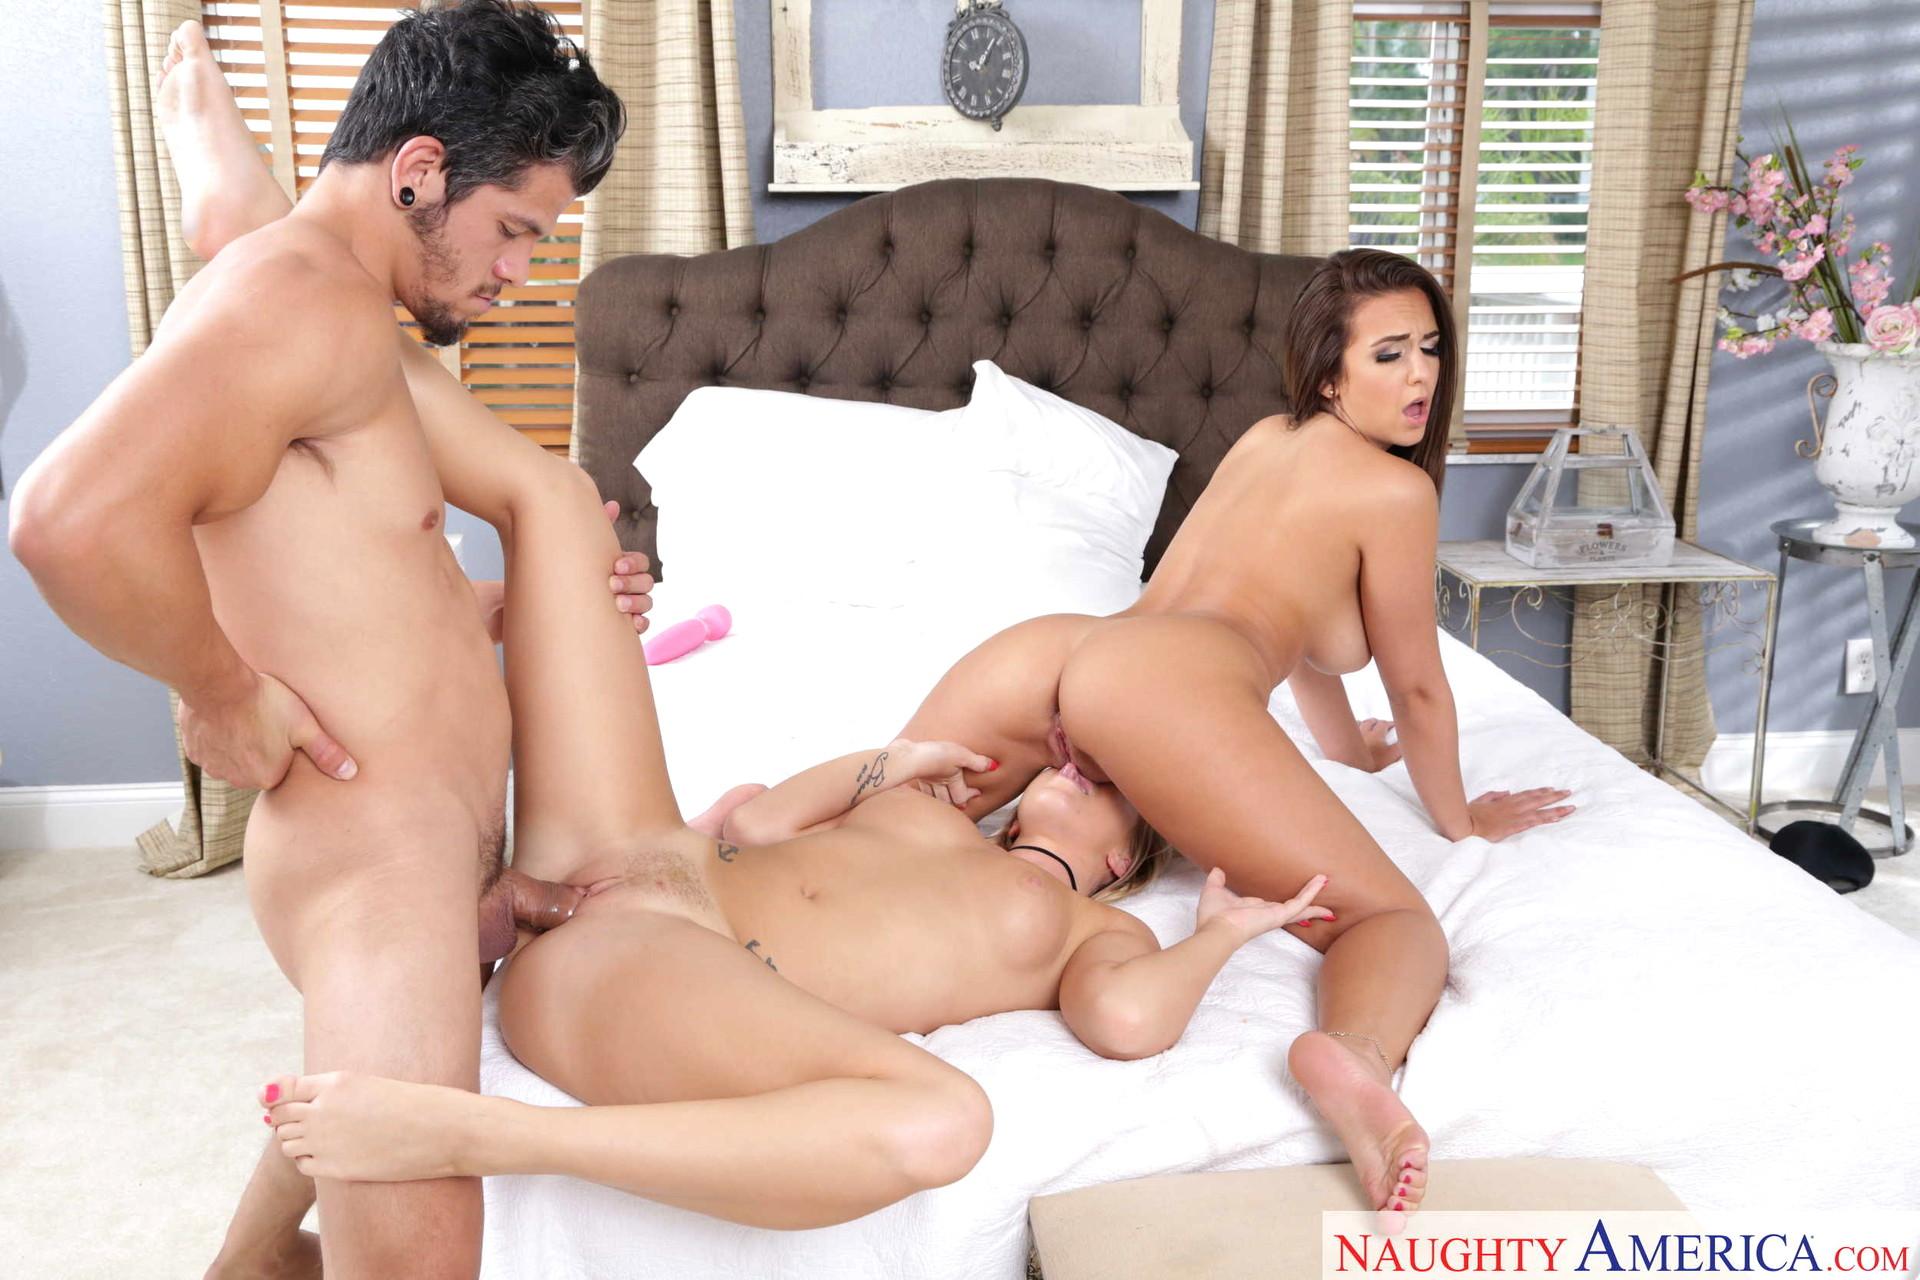 bailey brooke threesome